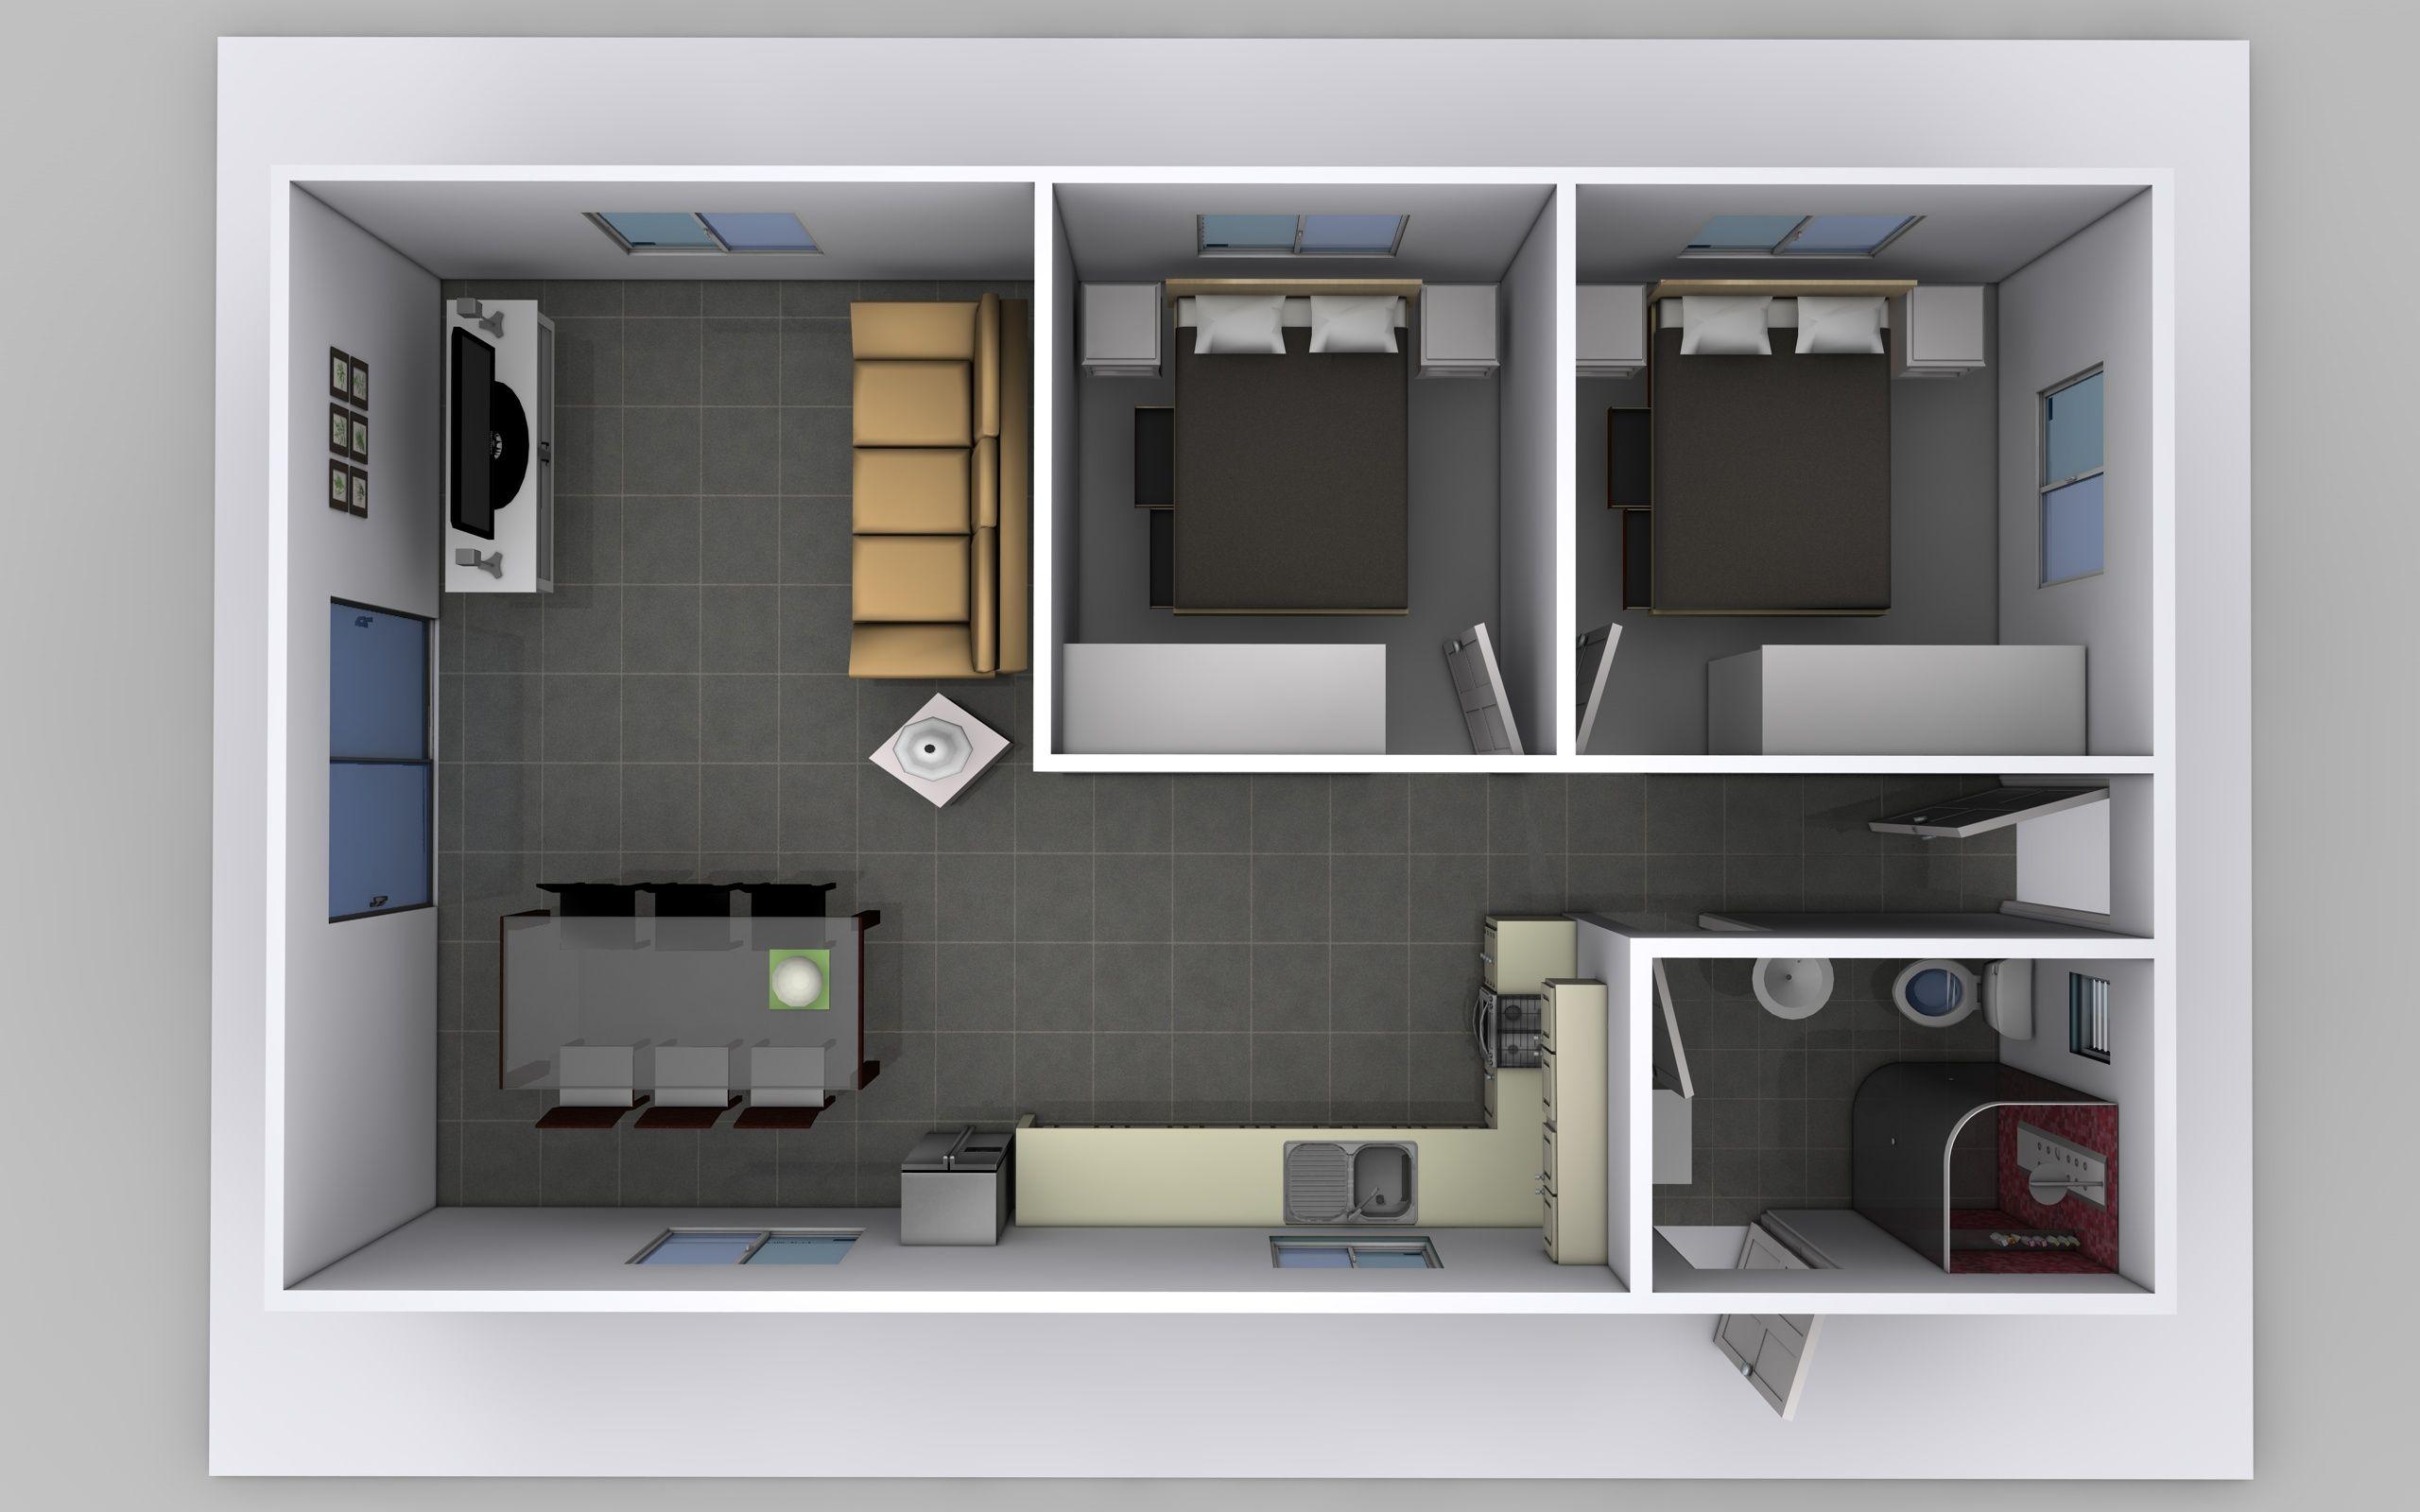 2 bedroom flat design ideas | design ideas 2017-2018 | Pinterest ...